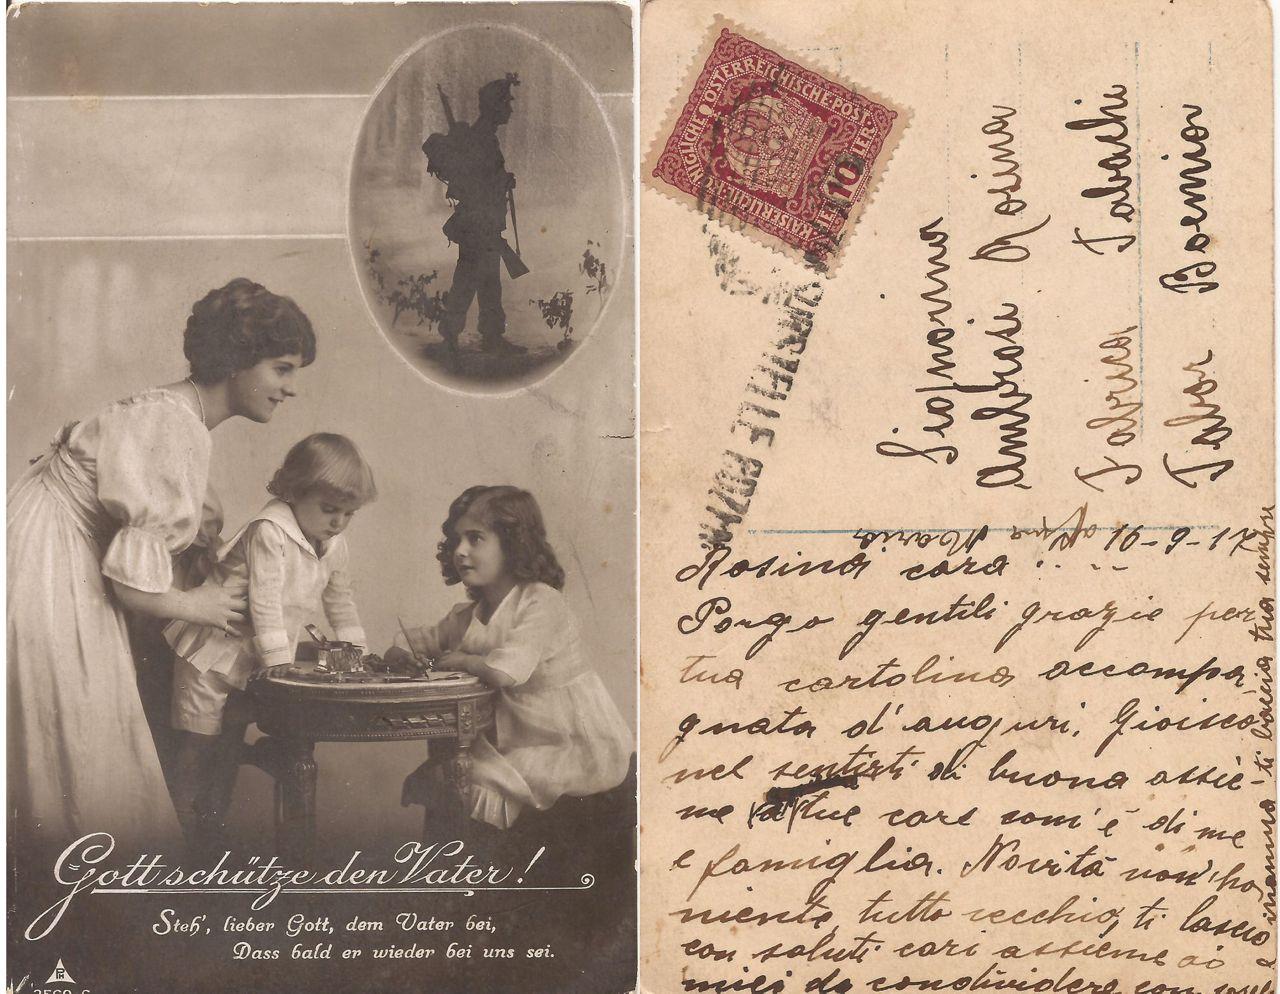 Cartolina austriaca 16 settembre 1917